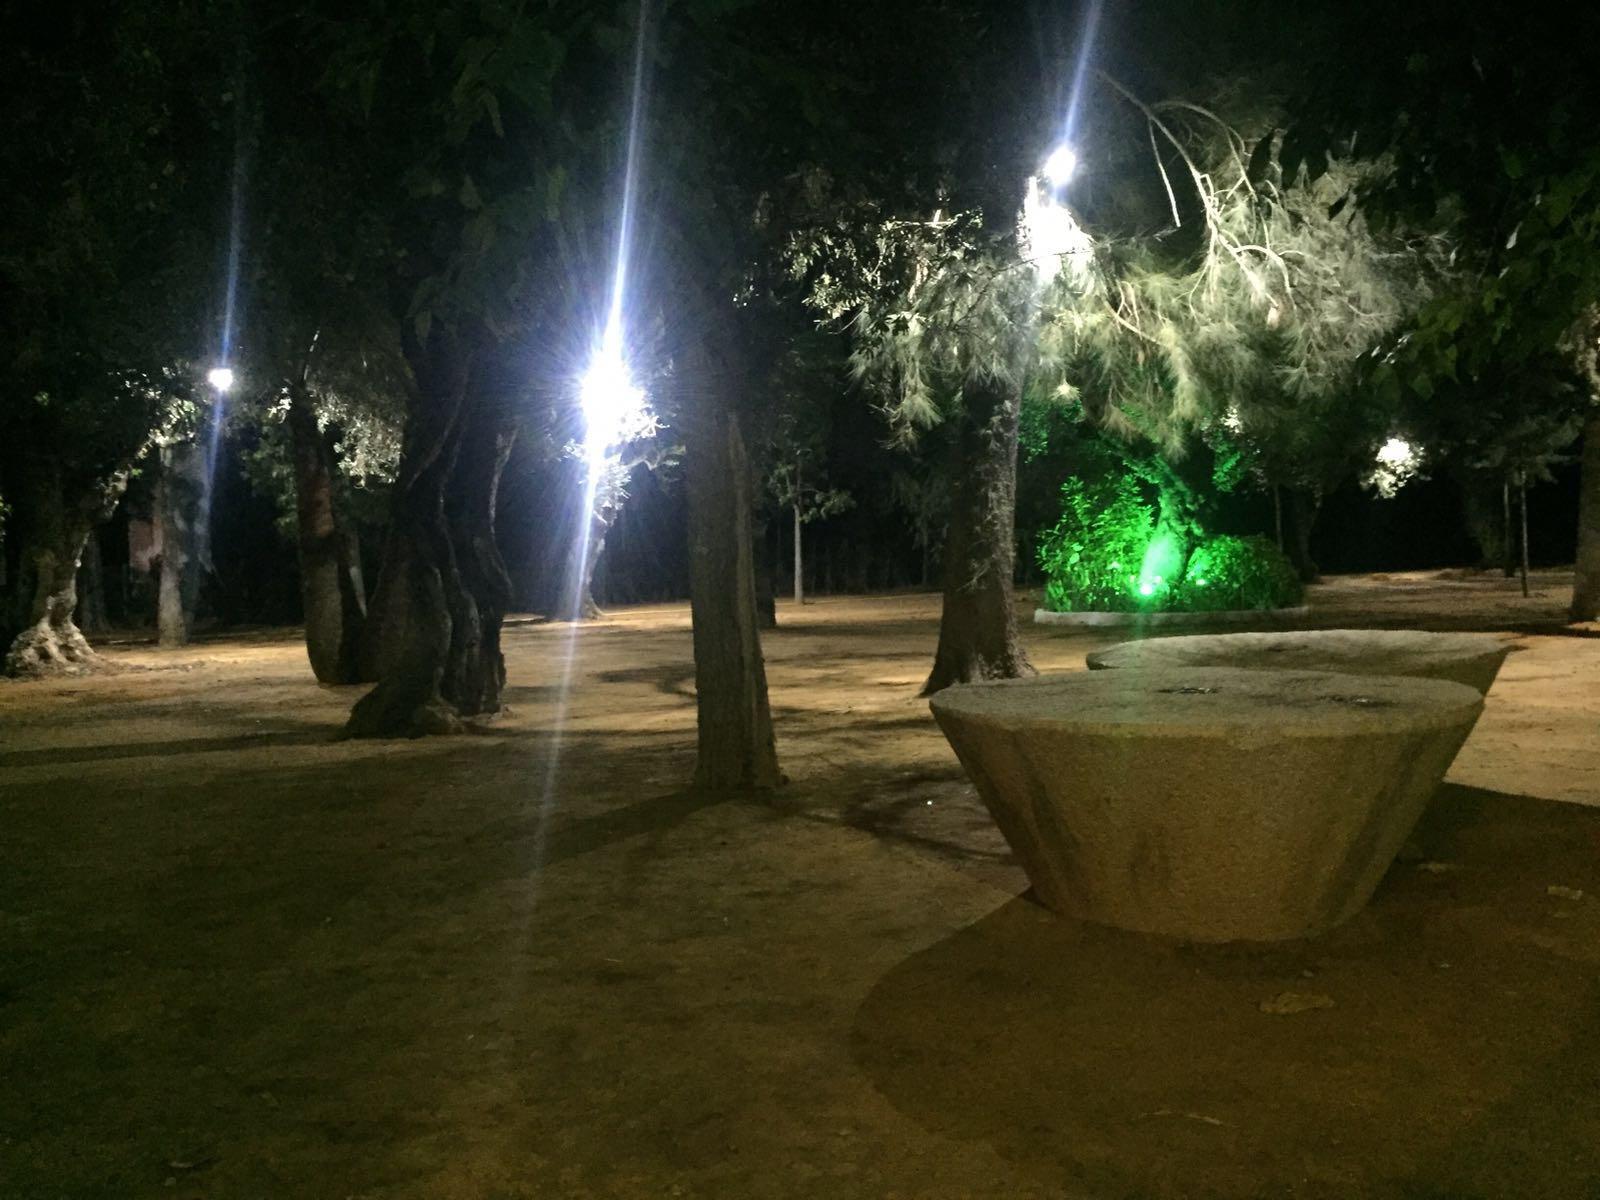 Iluminaci n para jardines y eventos climalcor - Iluminacion para jardines ...